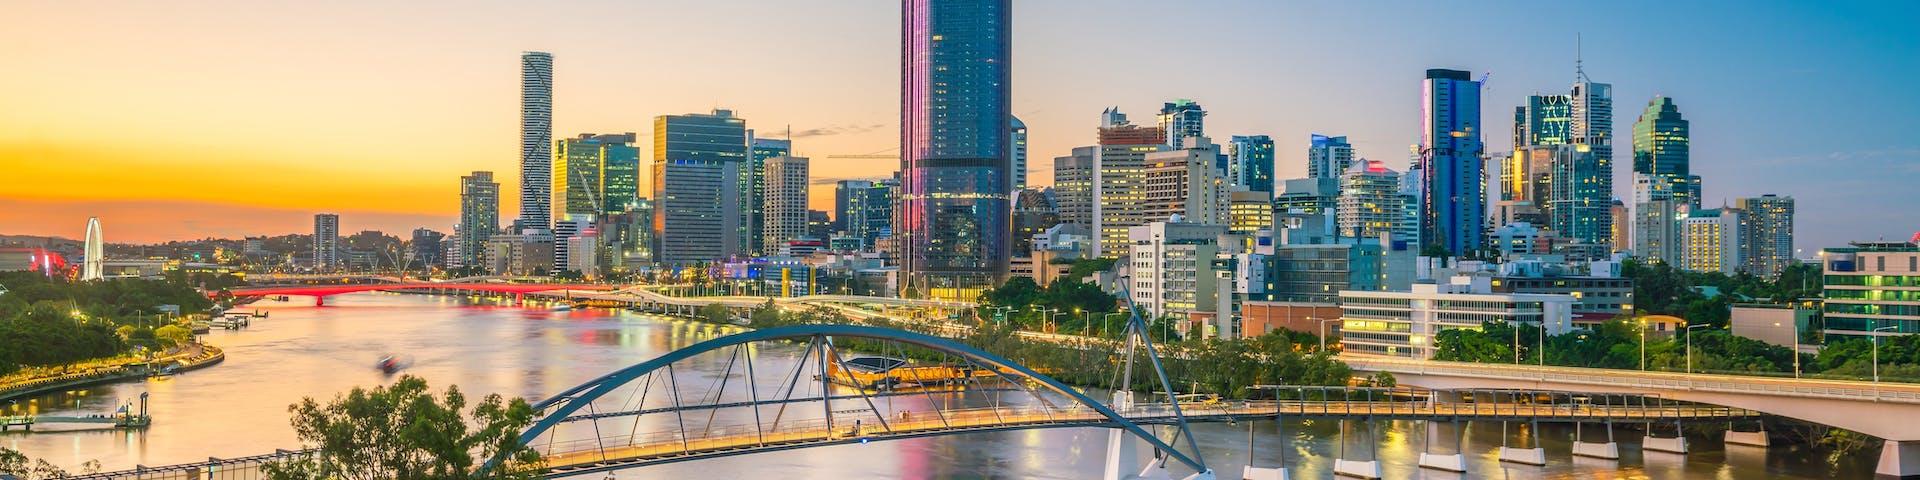 7 Best Student Cities in Australia in 2019 - MastersPortal com